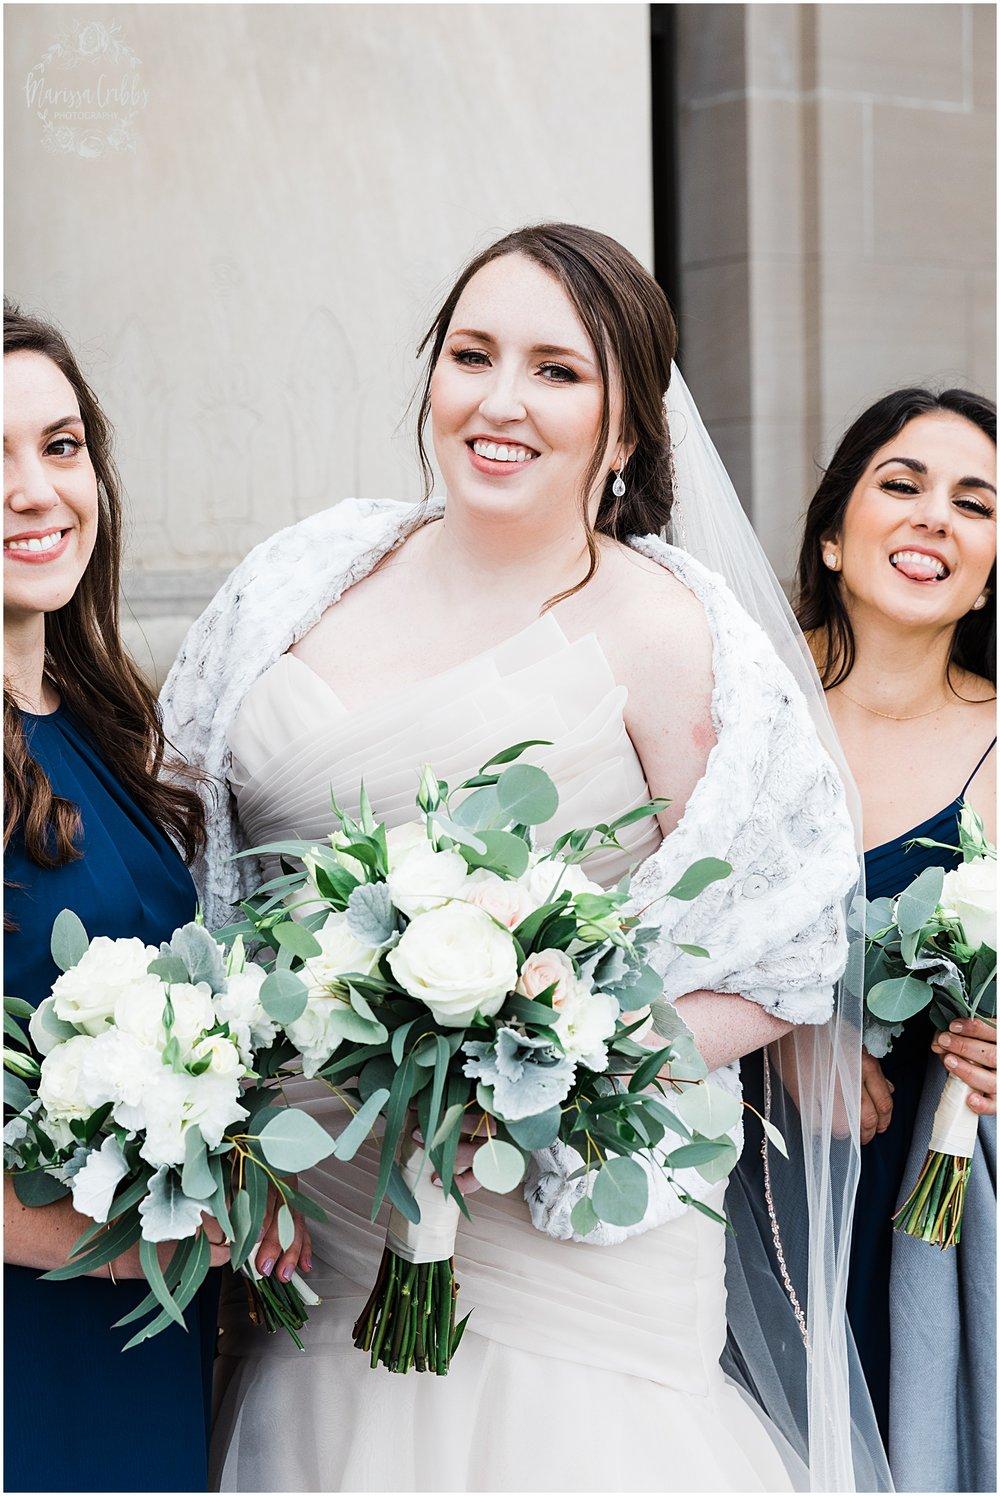 JULIA & AUSTIN MADRID THEATRE WEDDING | MARISSA CRIBBS PHOTOGRAPHY_7096.jpg